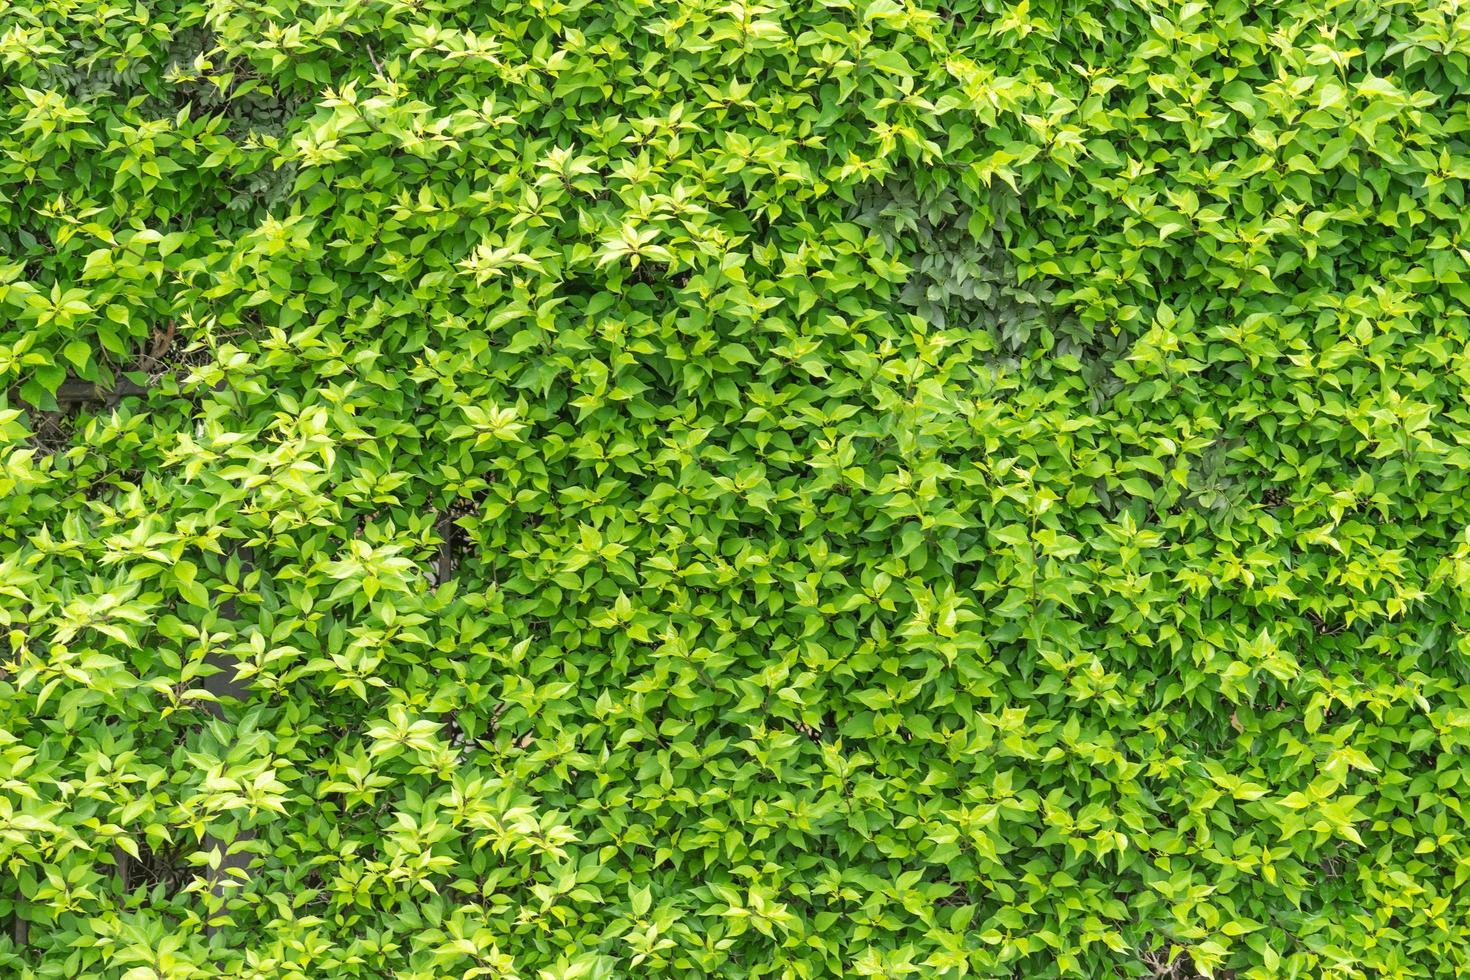 fond naturel de feuilles vertes photo